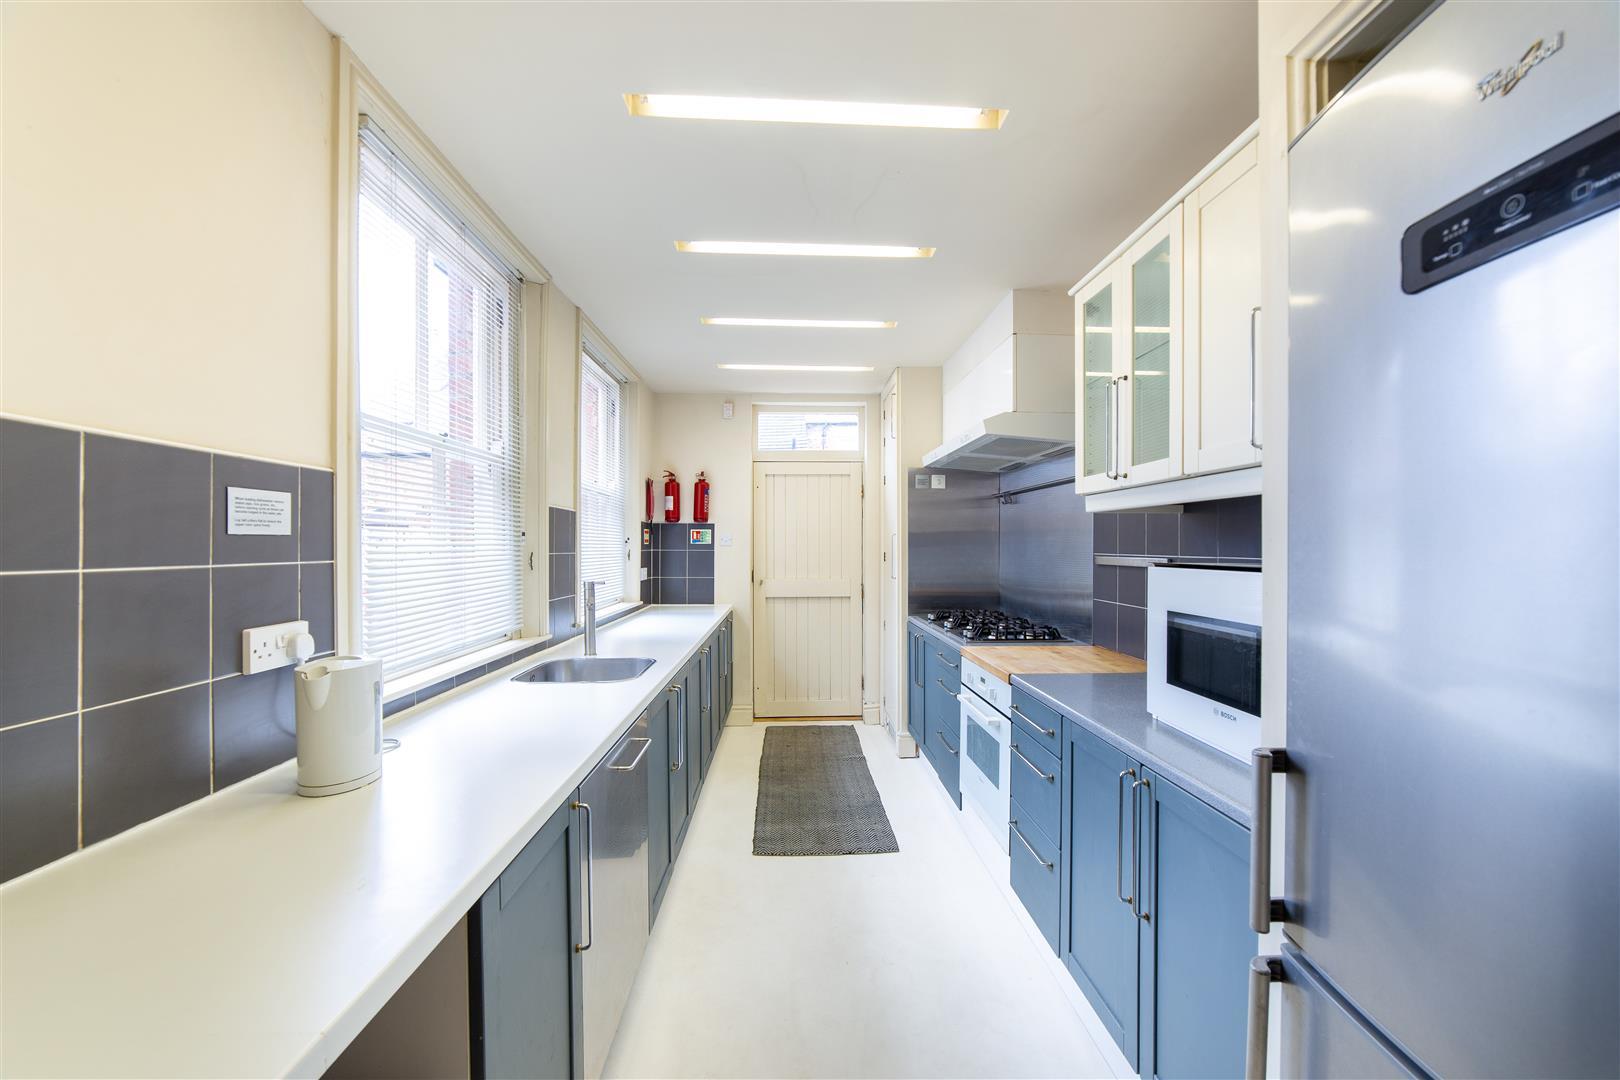 4 bed terraced house to rent in Cardigan Terrace, Heaton, NE6